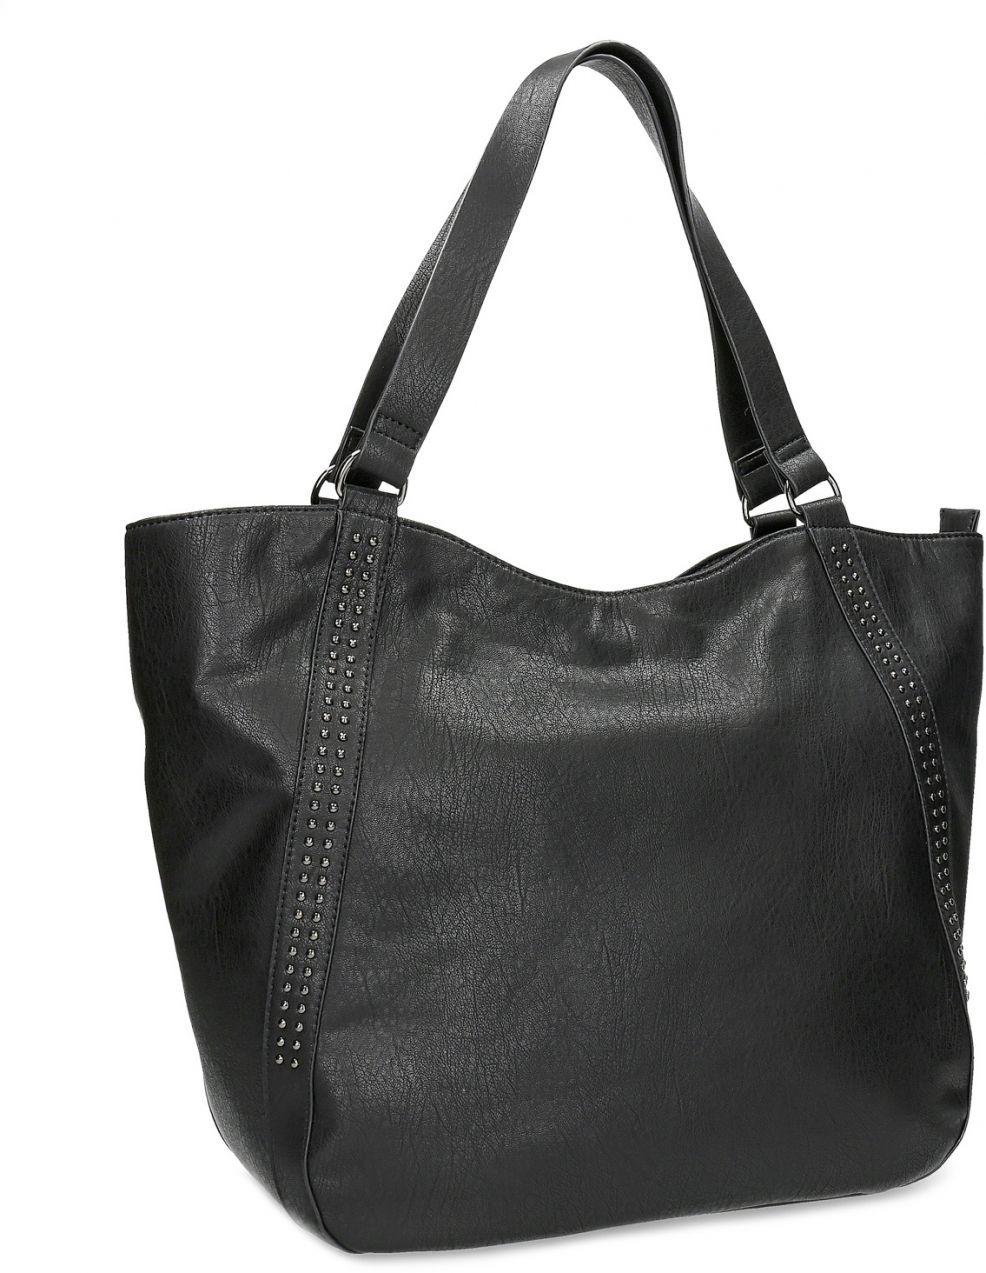 Čierna dámska kabelka s prešitím značky Baťa - Lovely.sk 04b1071820b